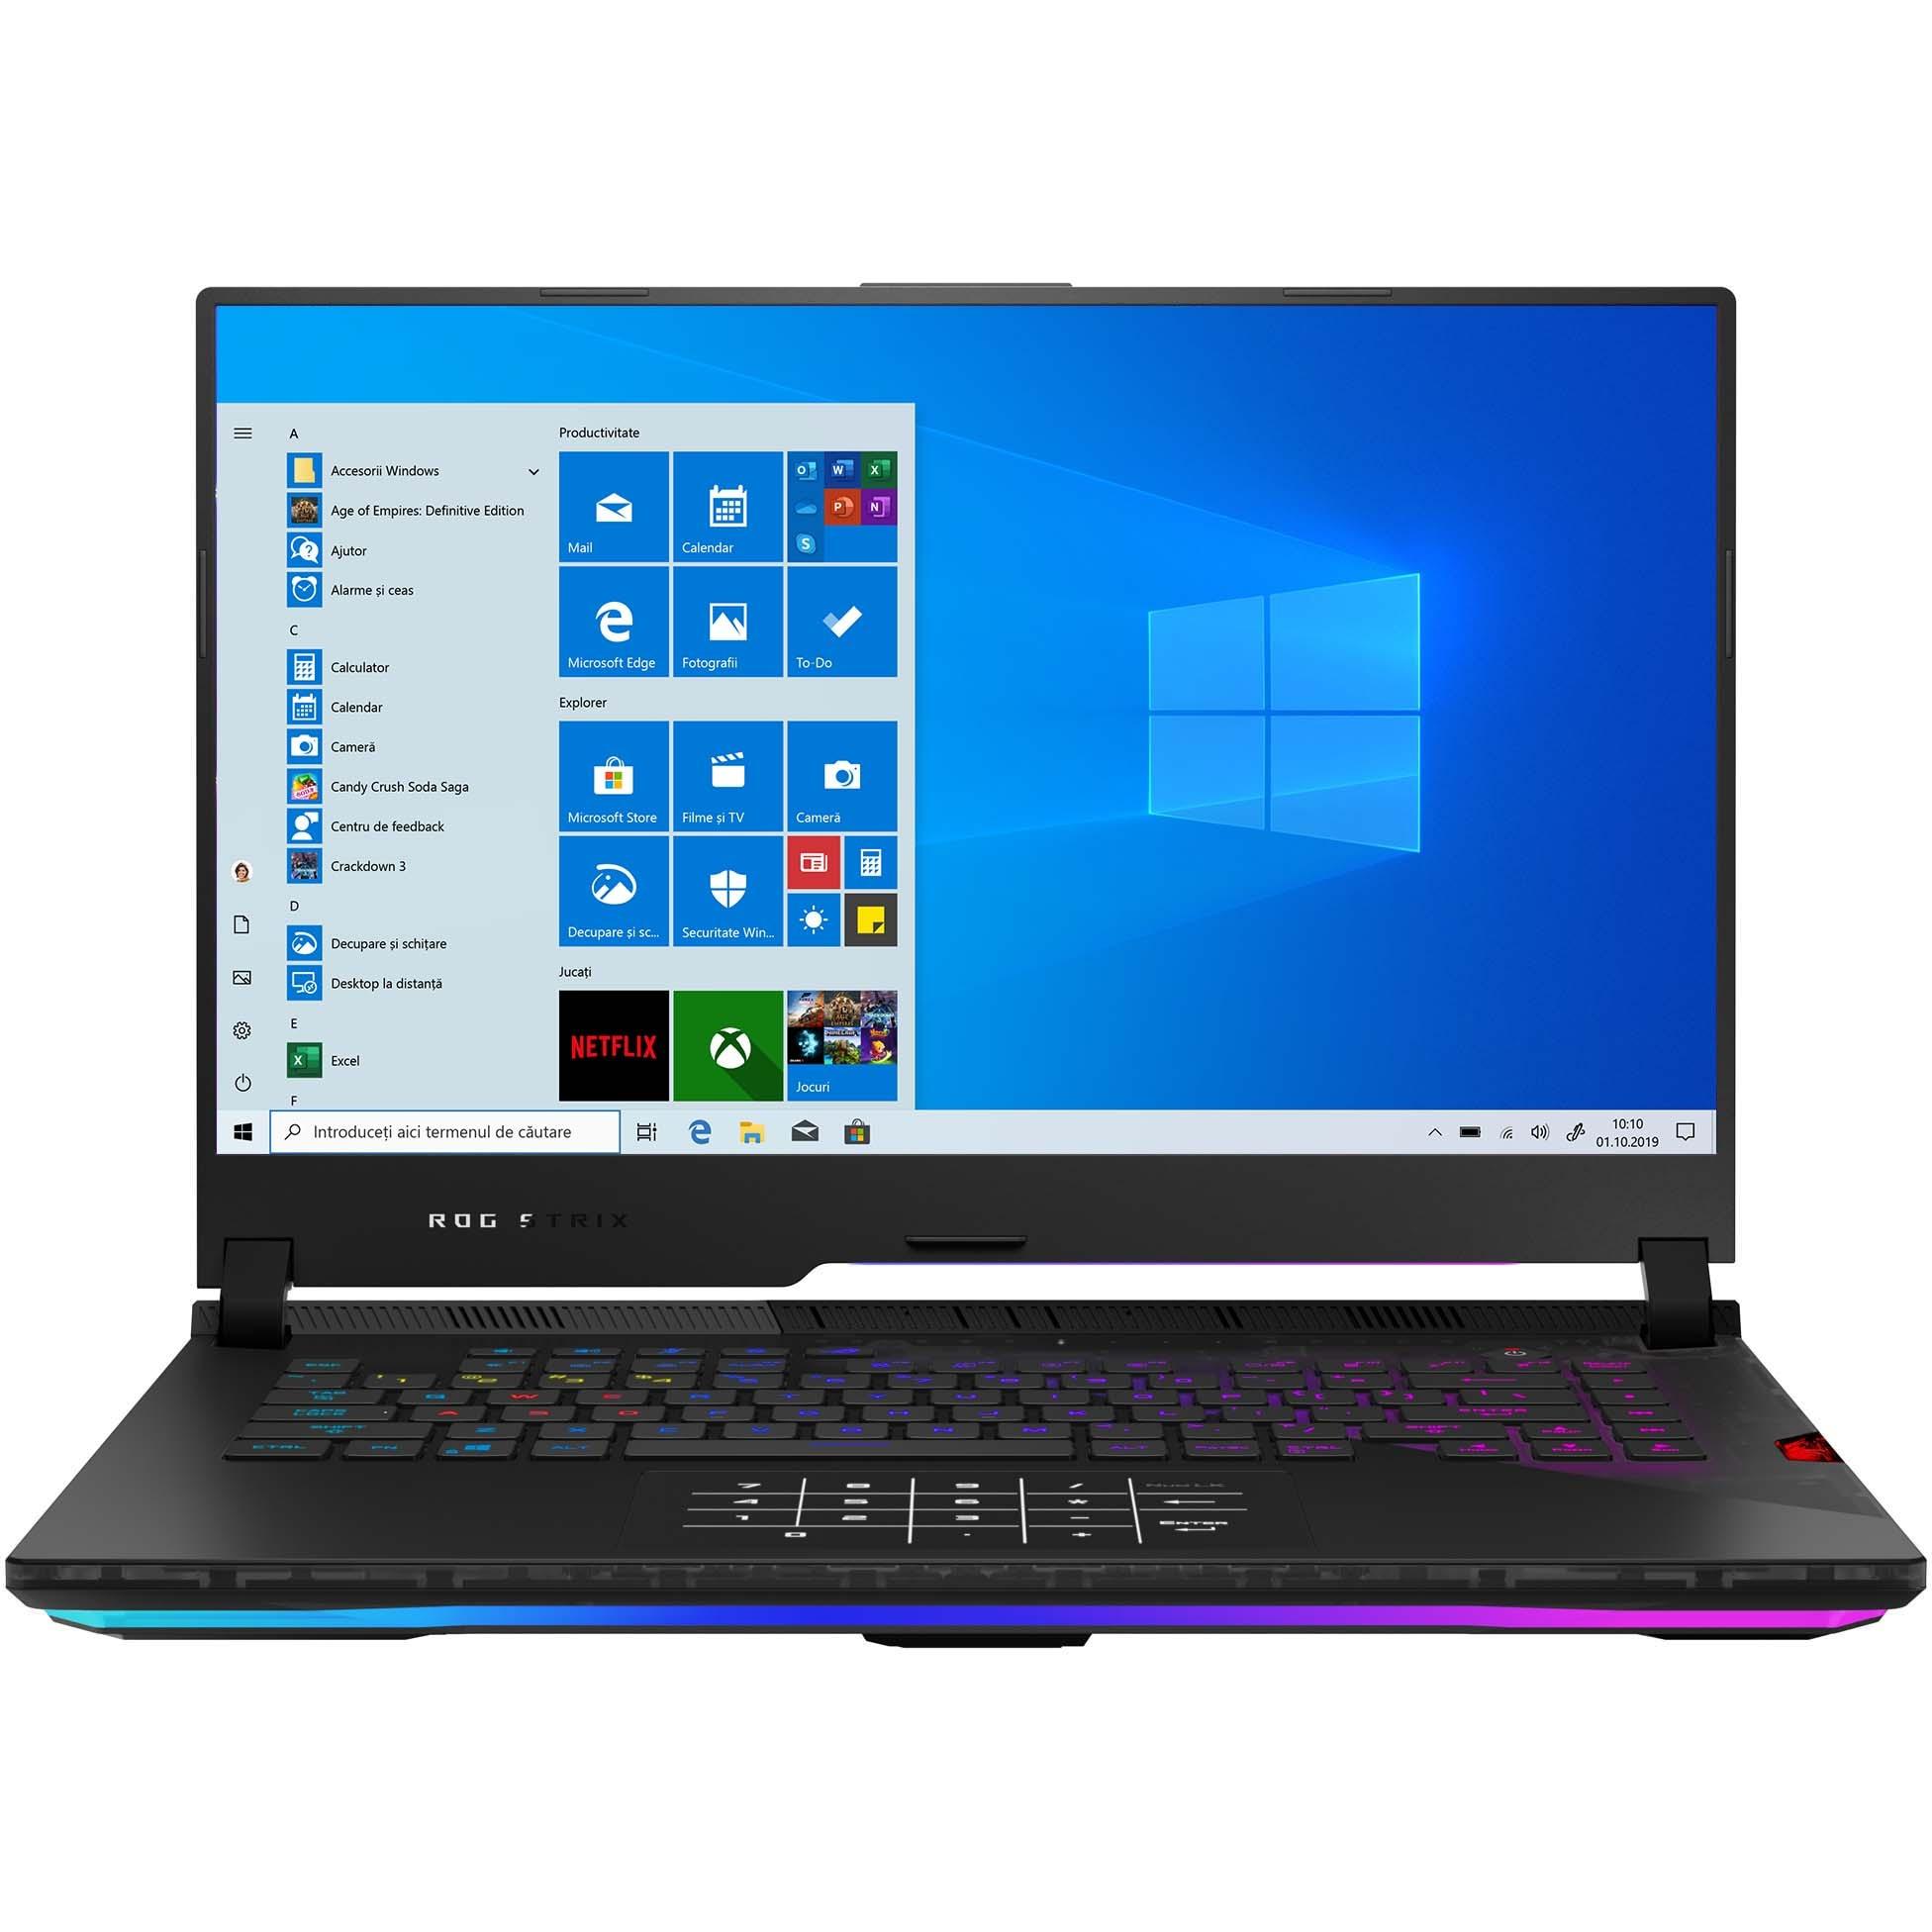 "Fotografie Laptop Gaming ASUS ROG Strix SCAR 15 G533QR cu procesor AMD Ryzen™ 7 5800H pana la 4.40 GHz, 15.6"", Full HD, 300Hz, 16GB, 1TB SSD, NVIDIA® GeForce RTX™ 3070 8GB, Windows 10 Home, Black"